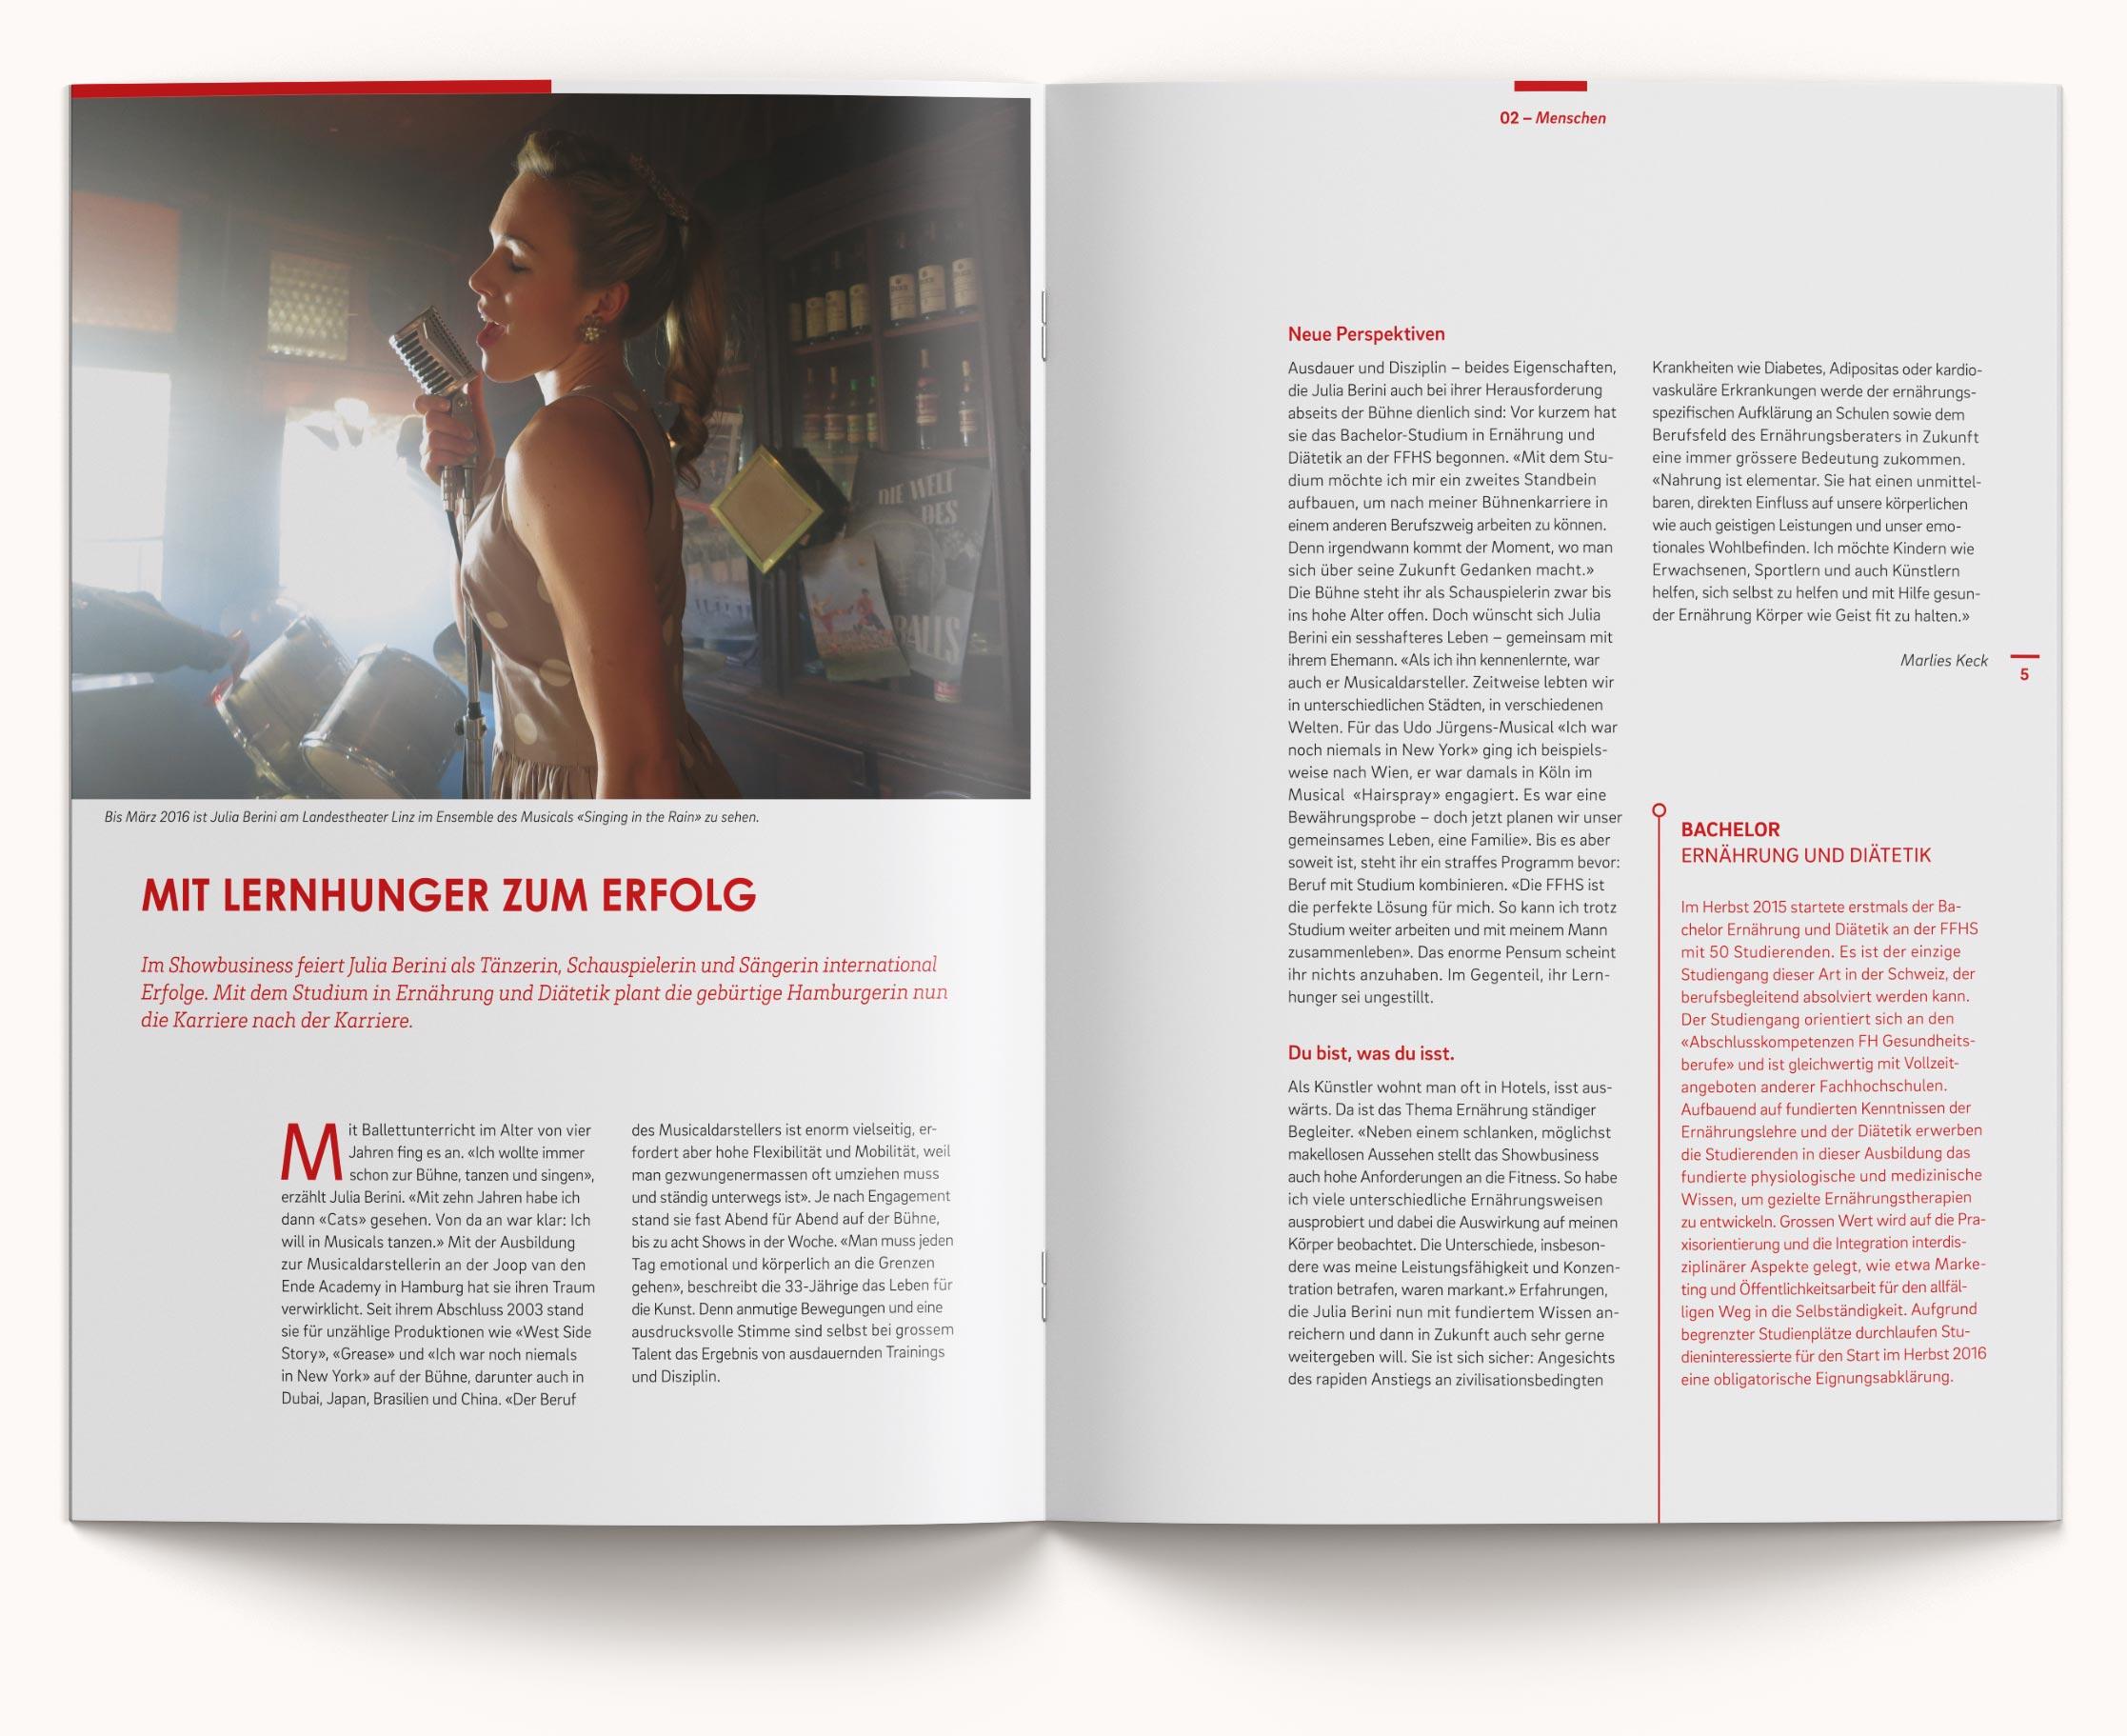 FFHS Grafikdesign Cloud Magazin Artikel Lernhunger